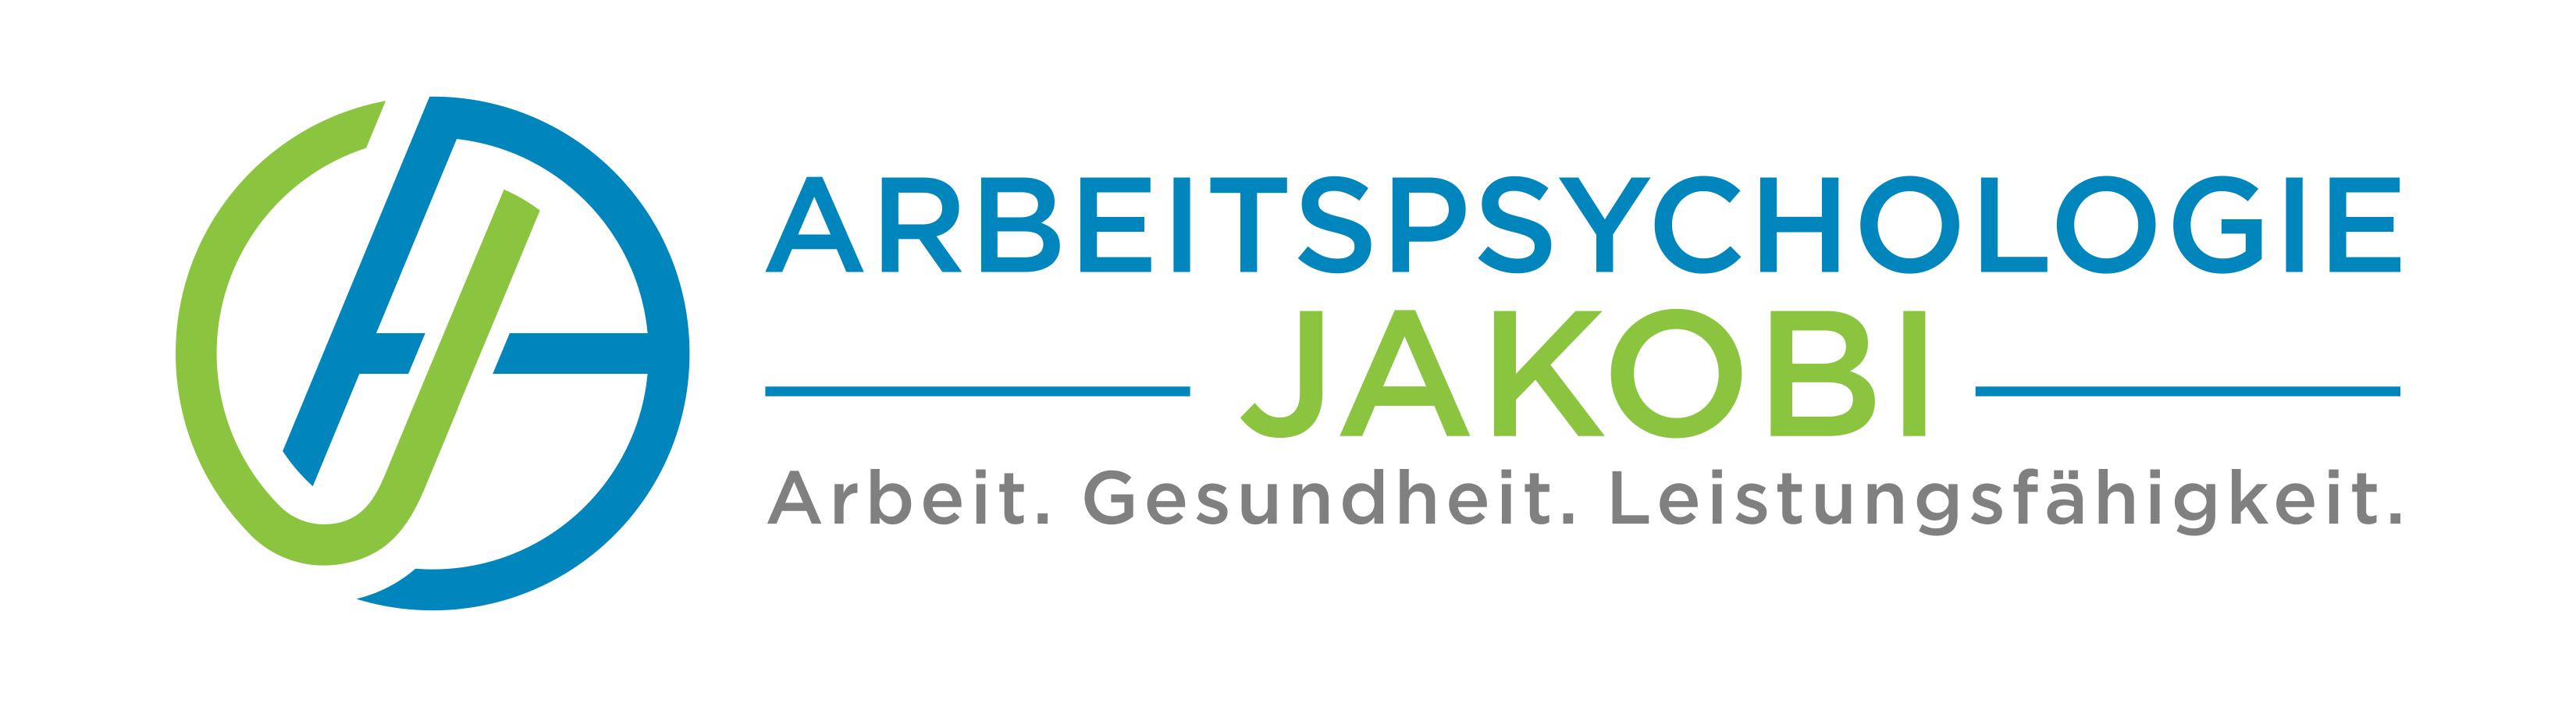 Arbeitspsychologie Jakobi